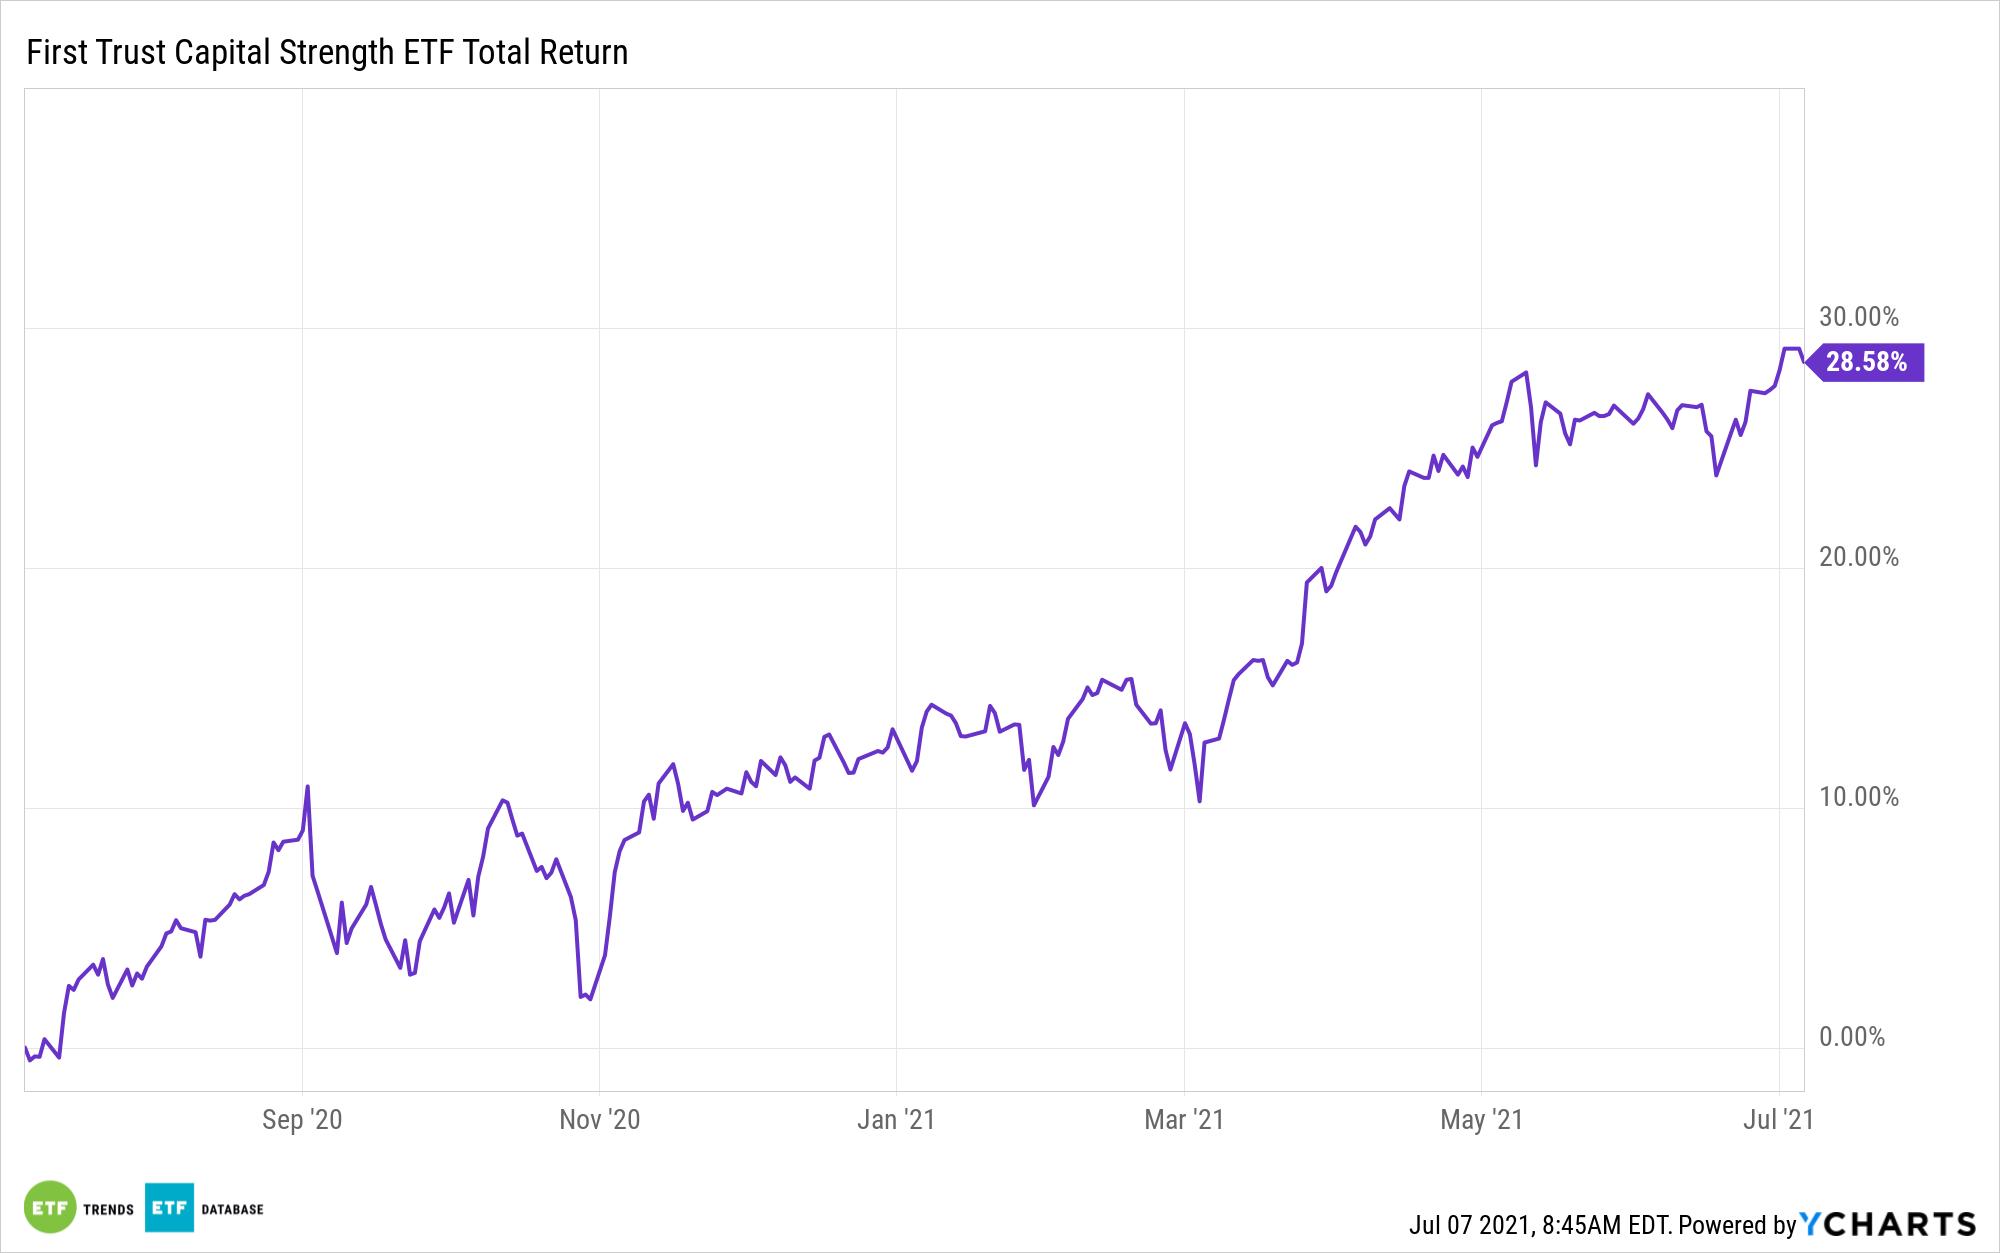 FTCS 1 Year Performance